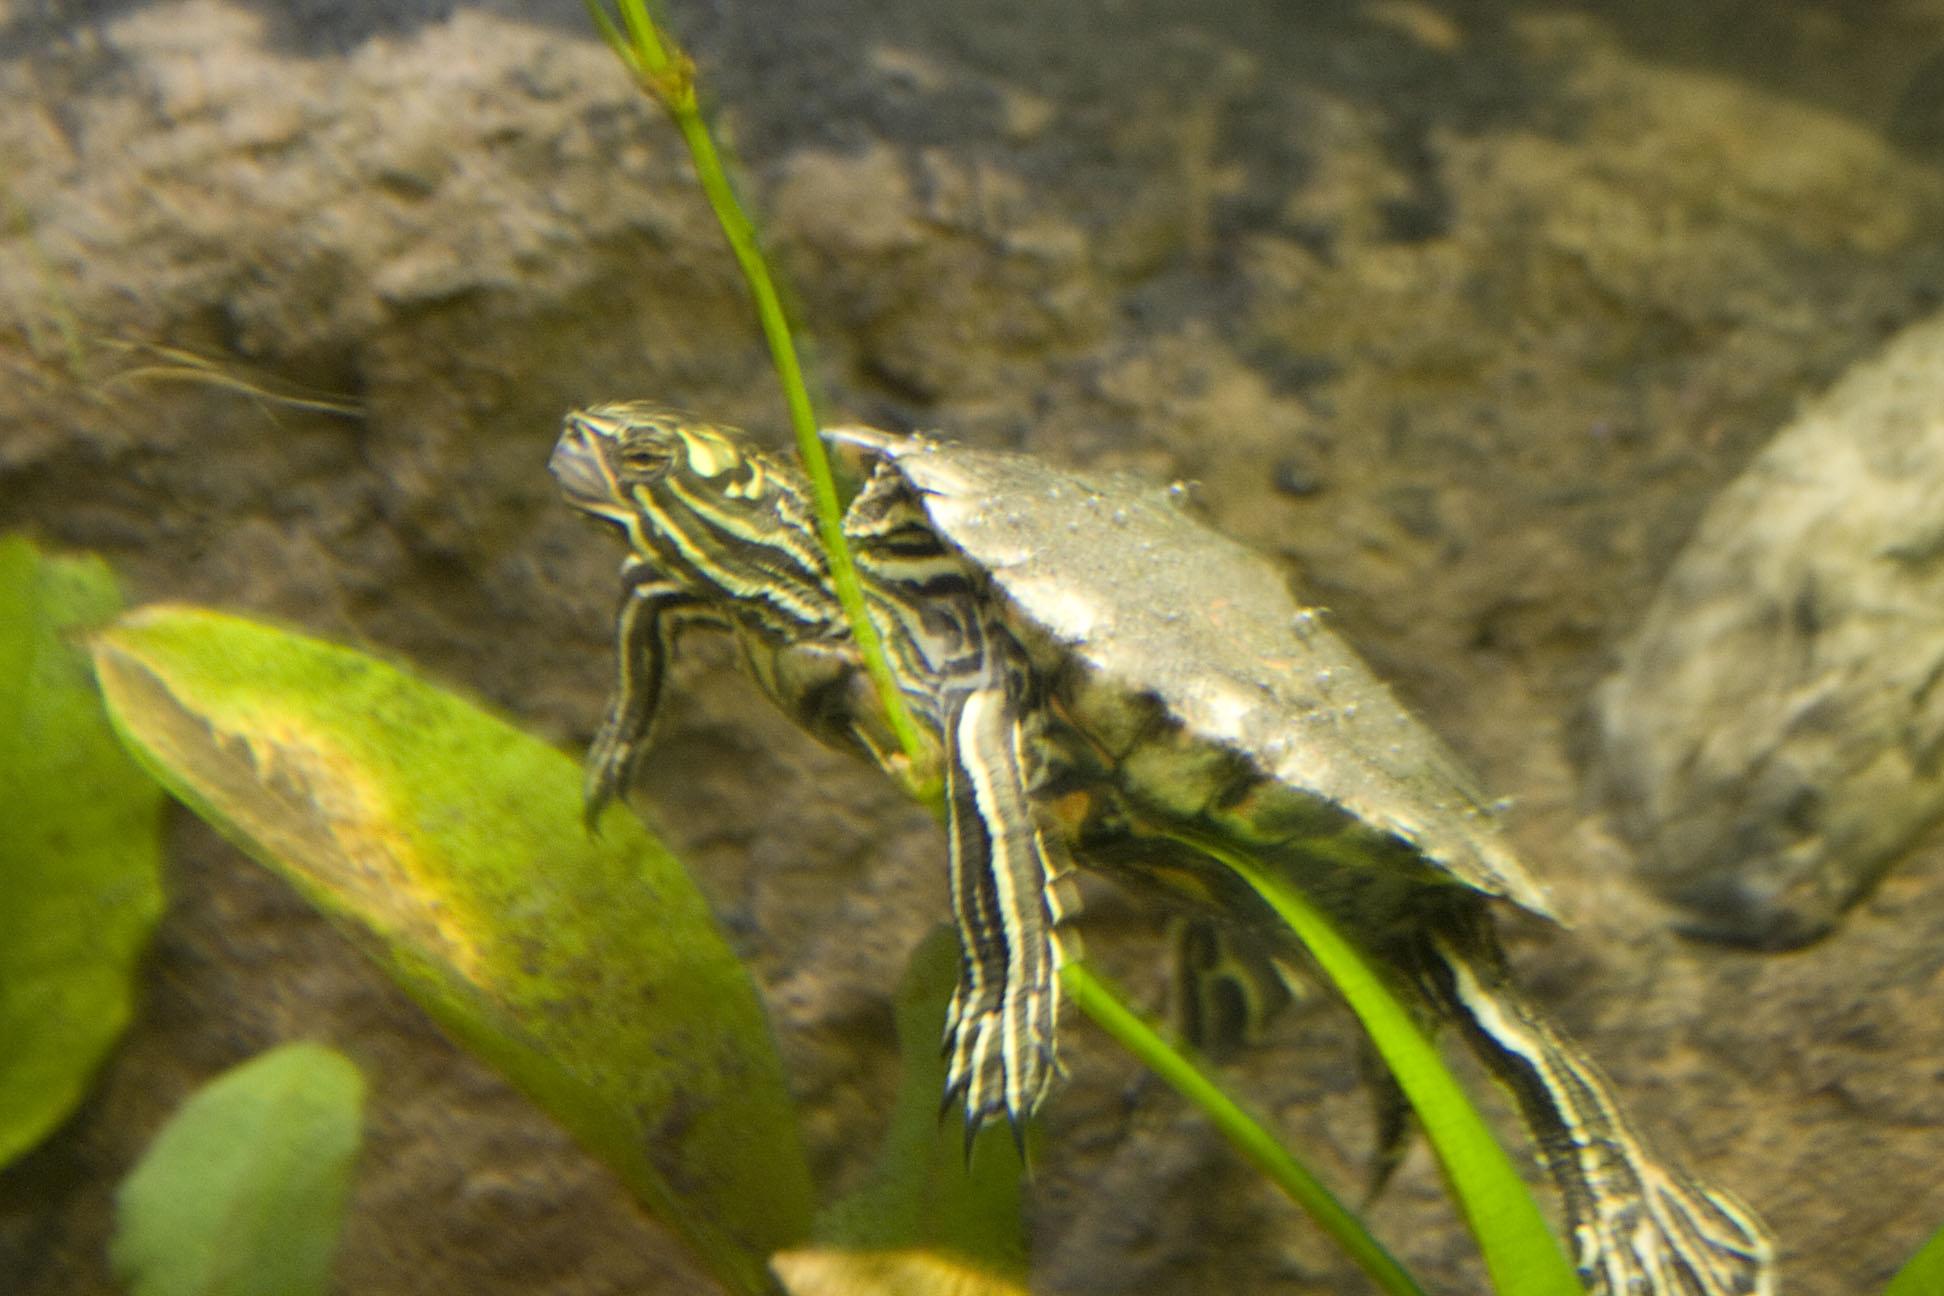 090326-shedd-aquarium-turtle-1 Vikki Baptistes Home-Based Business